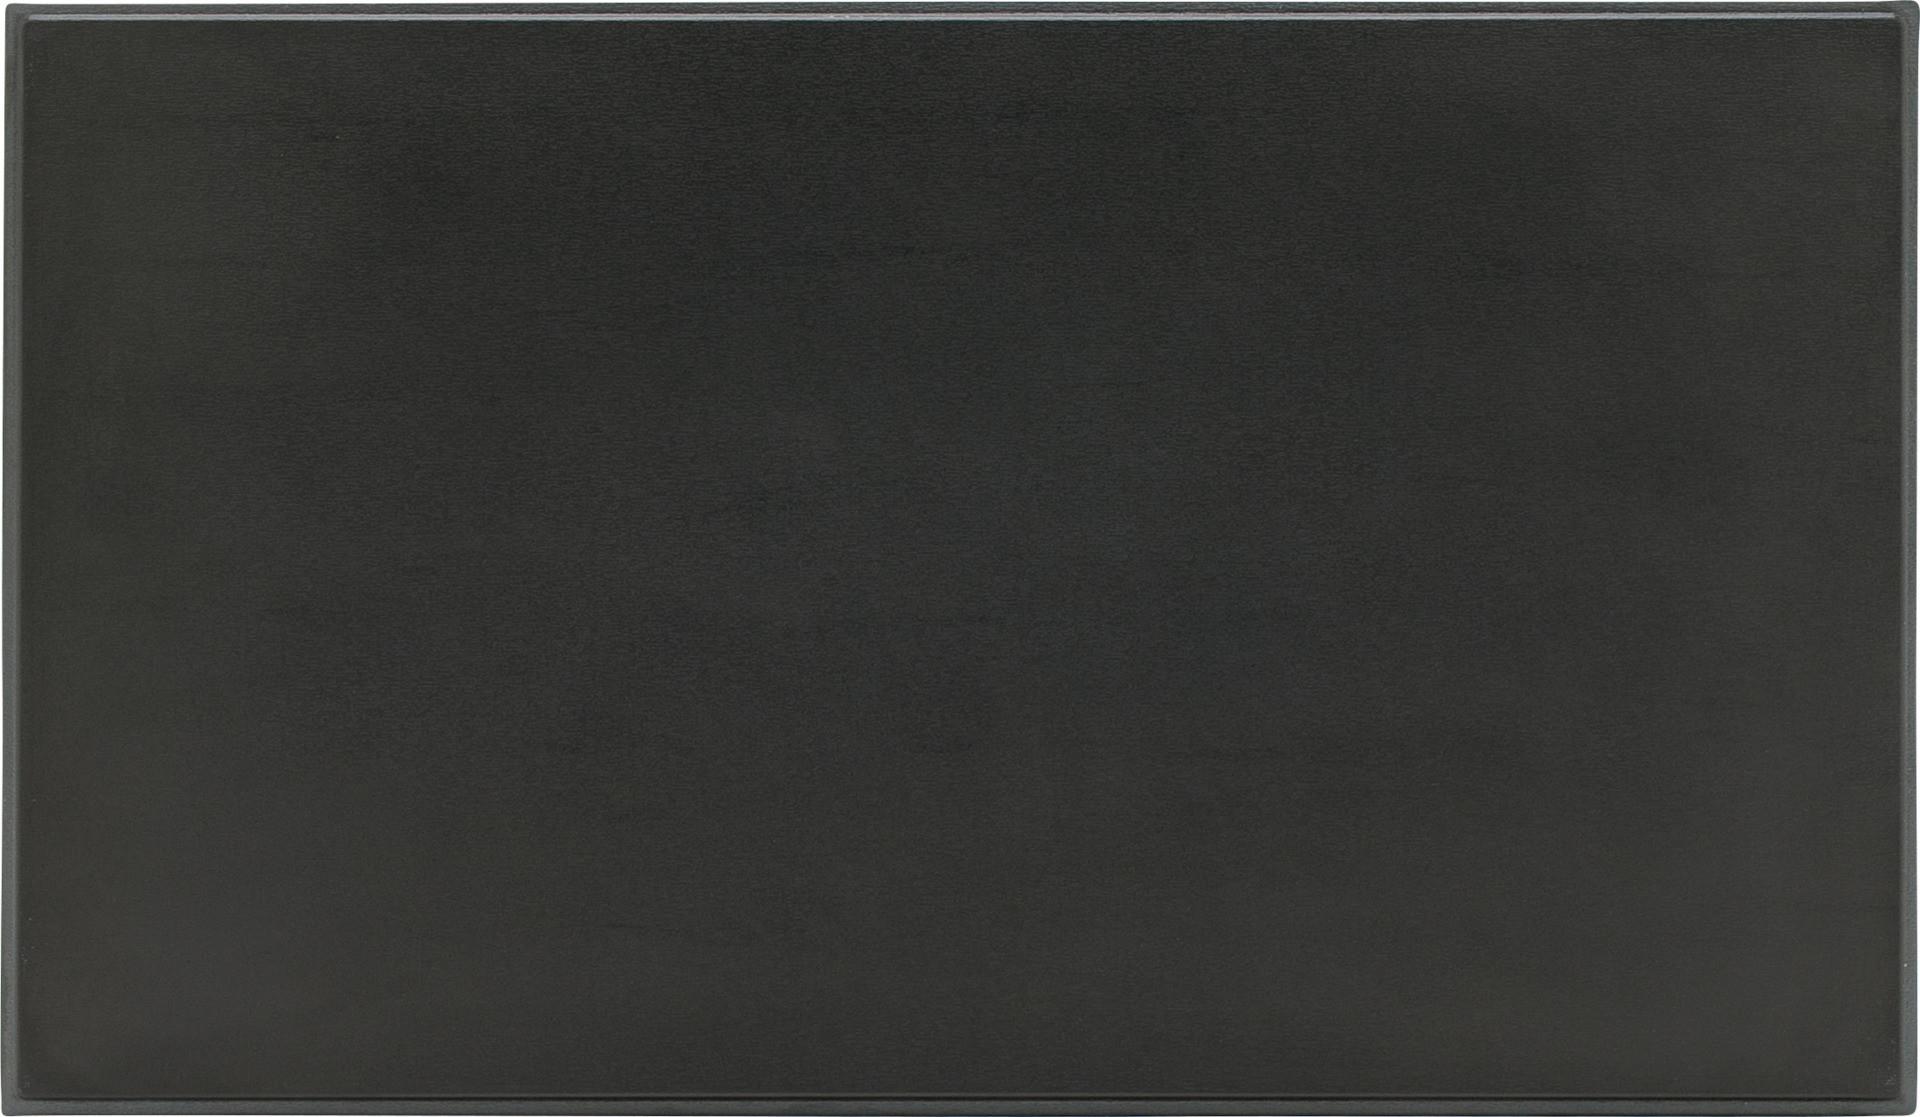 Emotion, Presenter (Kunststoff) stapelbar 500 x 295 x 107 mm schwarz